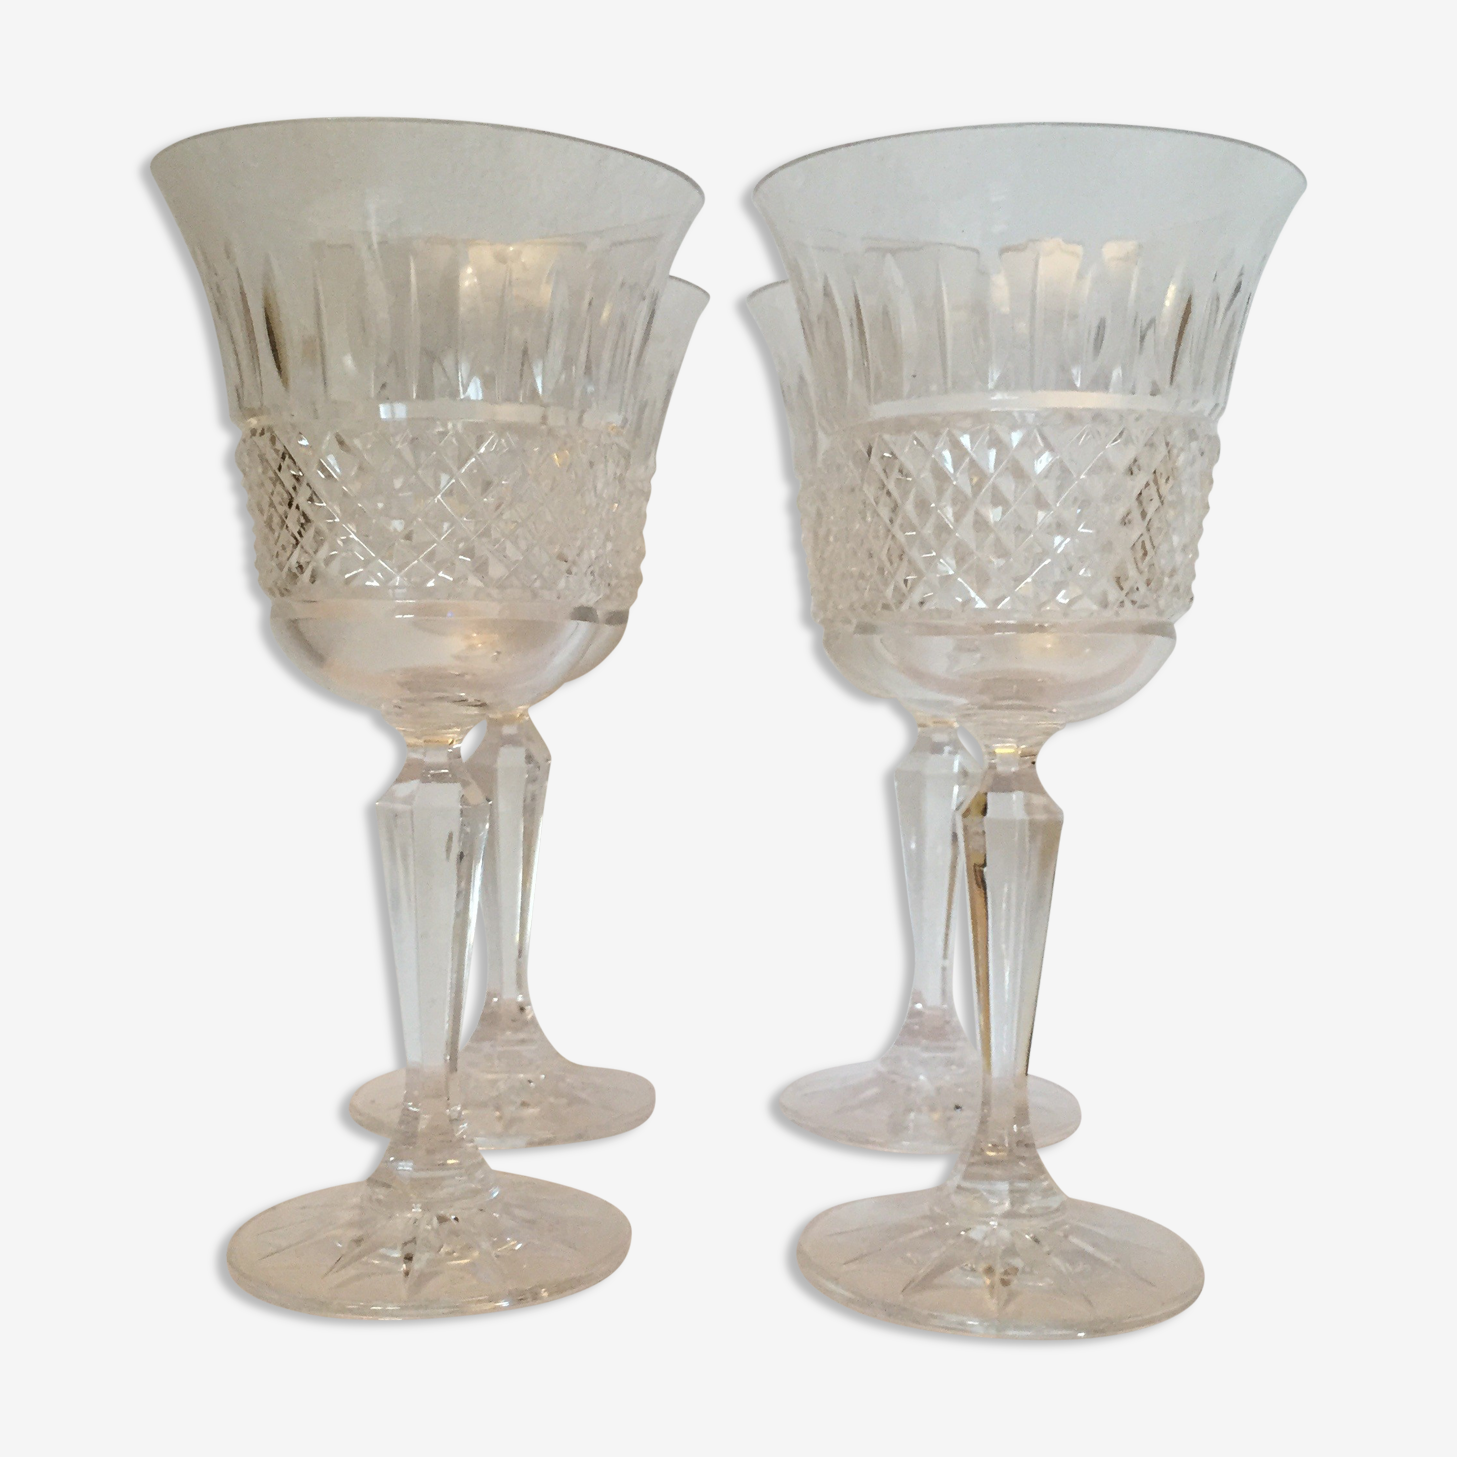 Ensemble de 4 verres en cristal